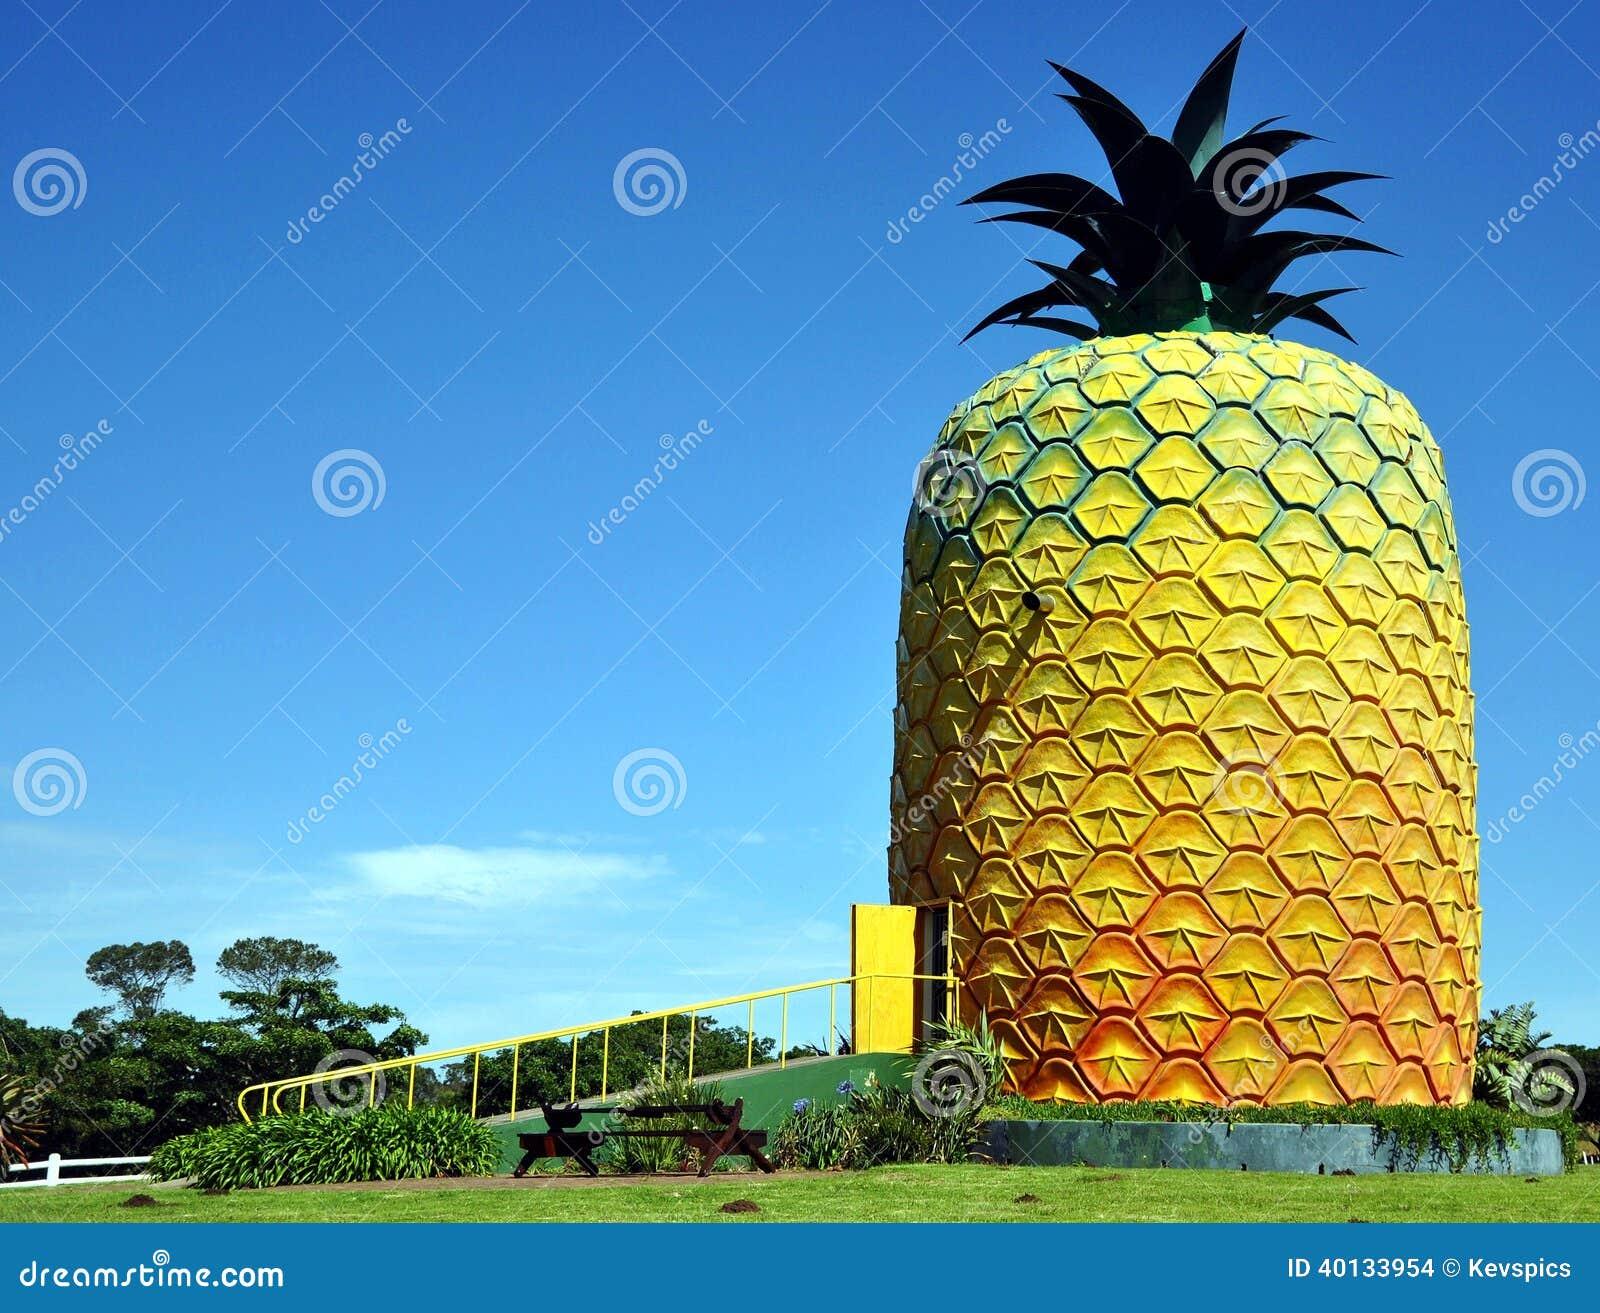 The Big Pineapple Summer Hill Farm Stock Photo Image